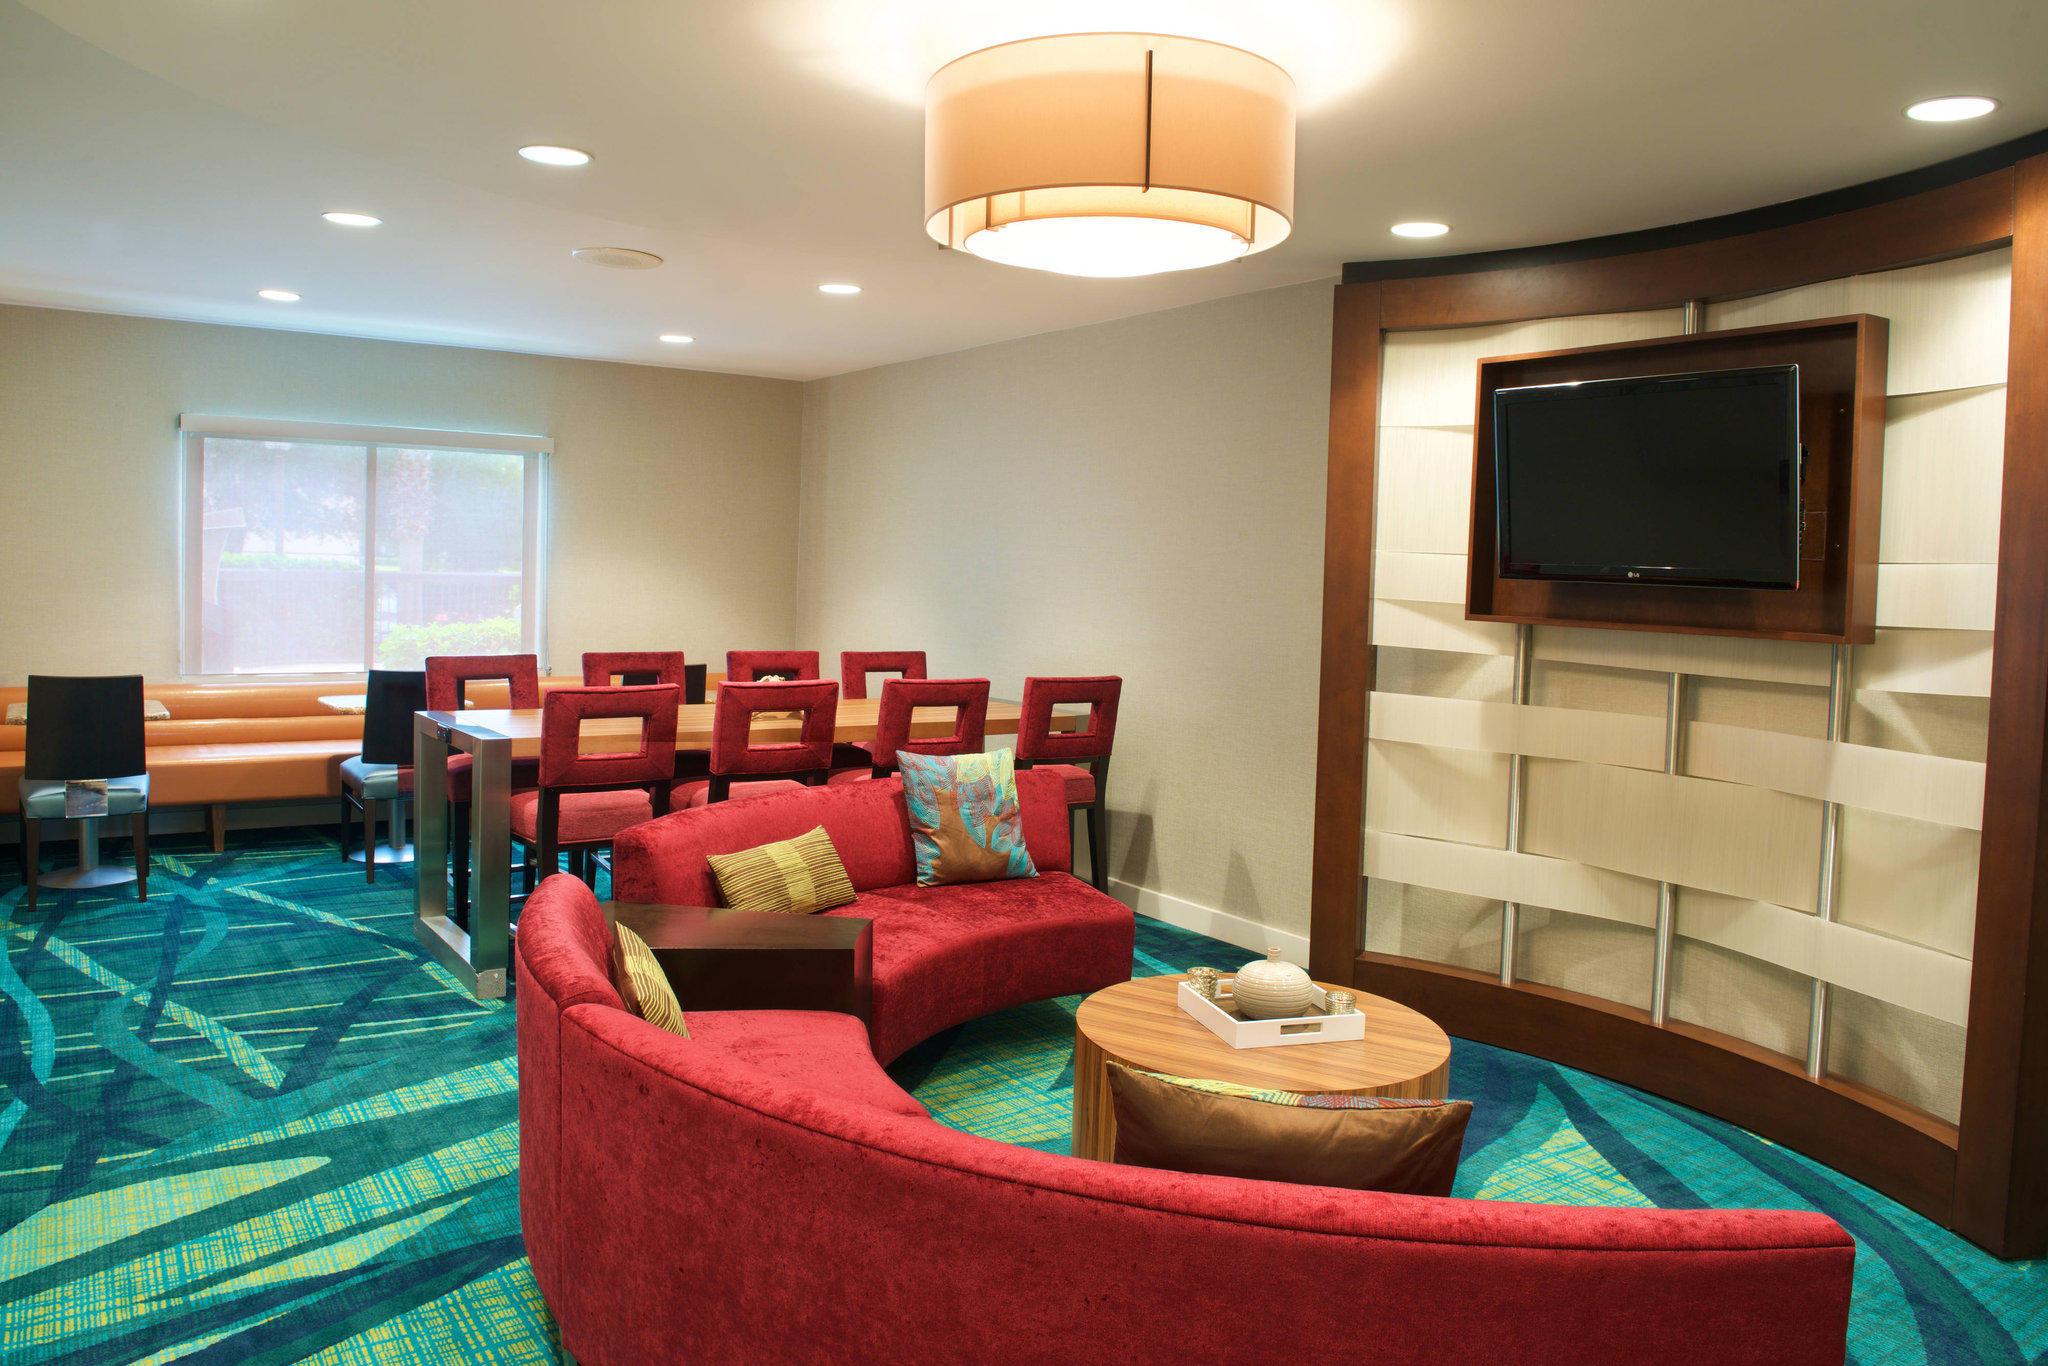 SpringHill Suites by Marriott Jacksonville